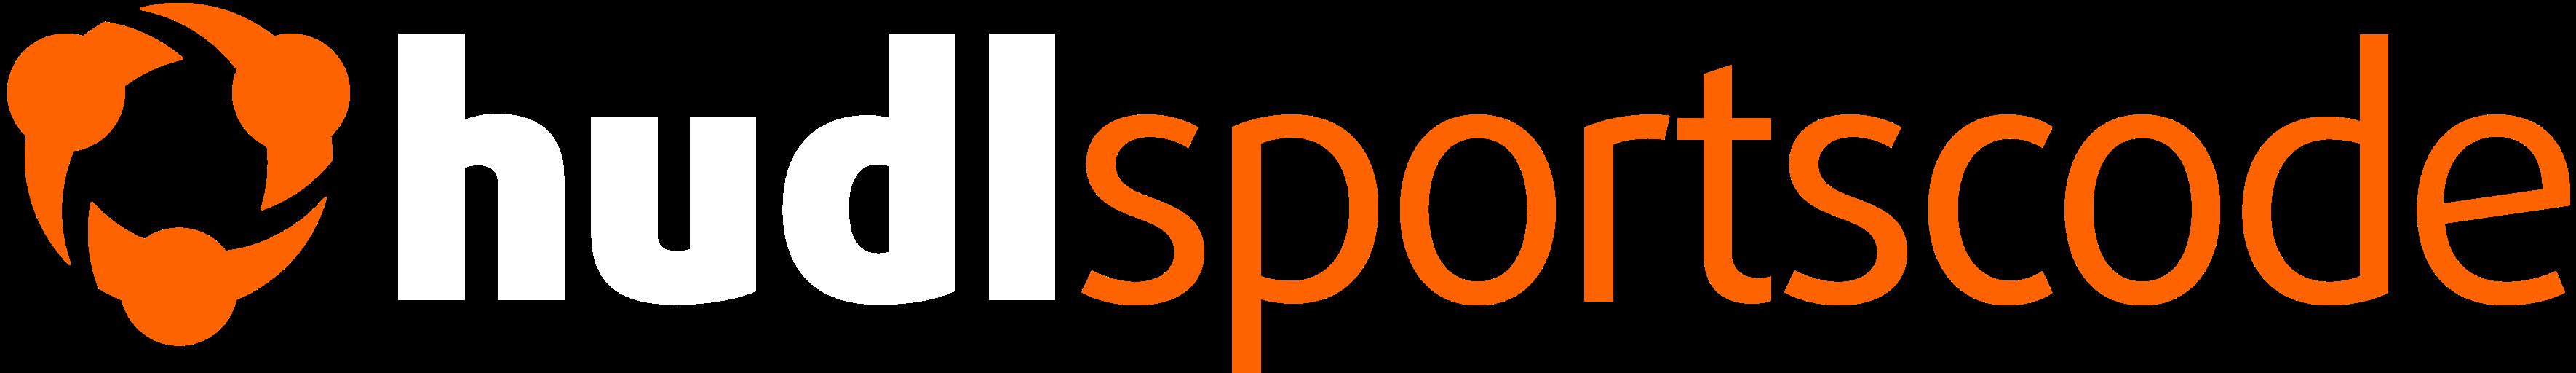 Hudl Sportscode Logo